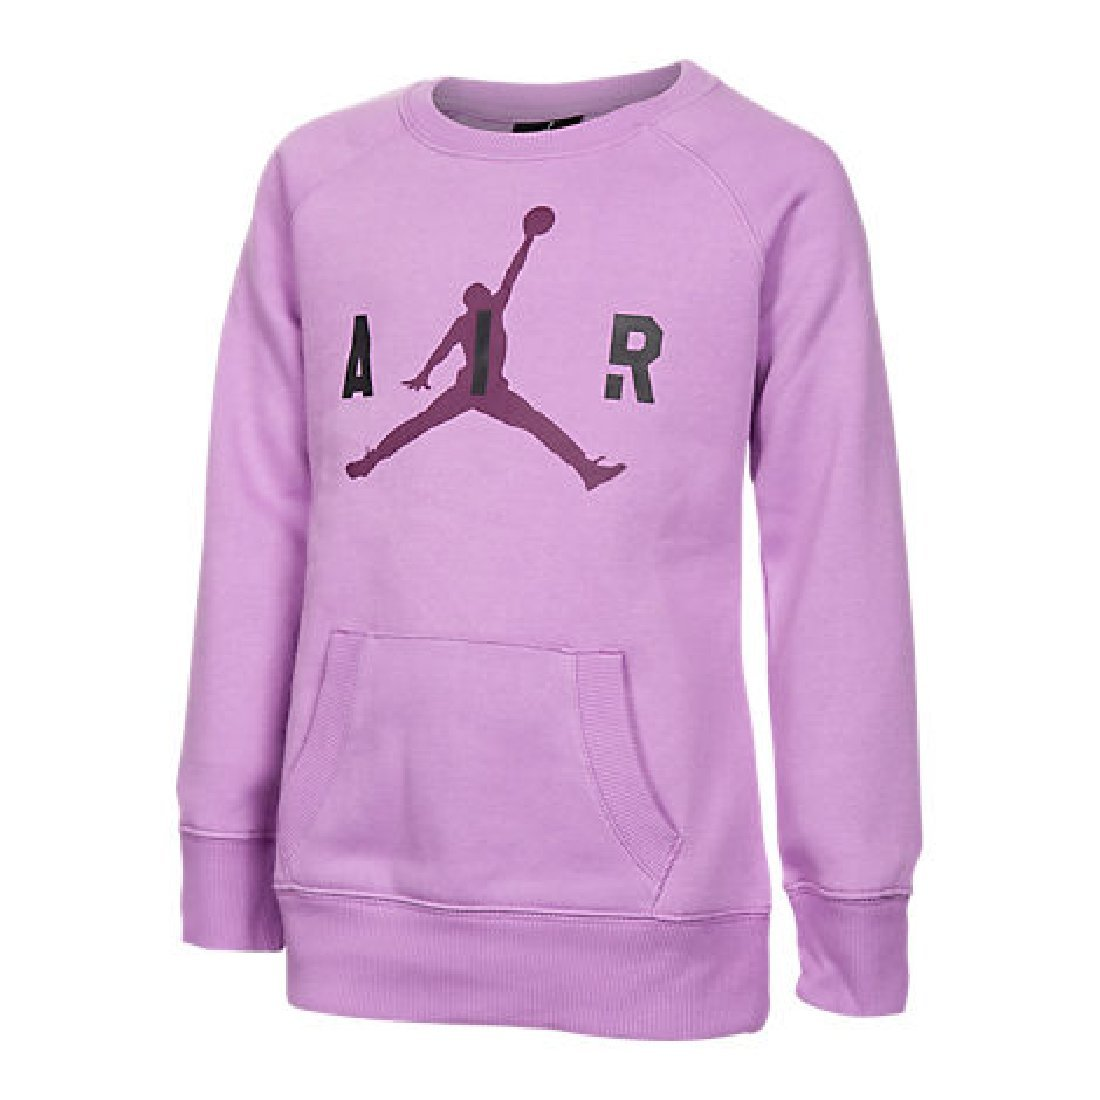 Girls' Jordan Big Air Crew Sweatshirt Fuchsia Glow/Mulberry/Black Size 6X